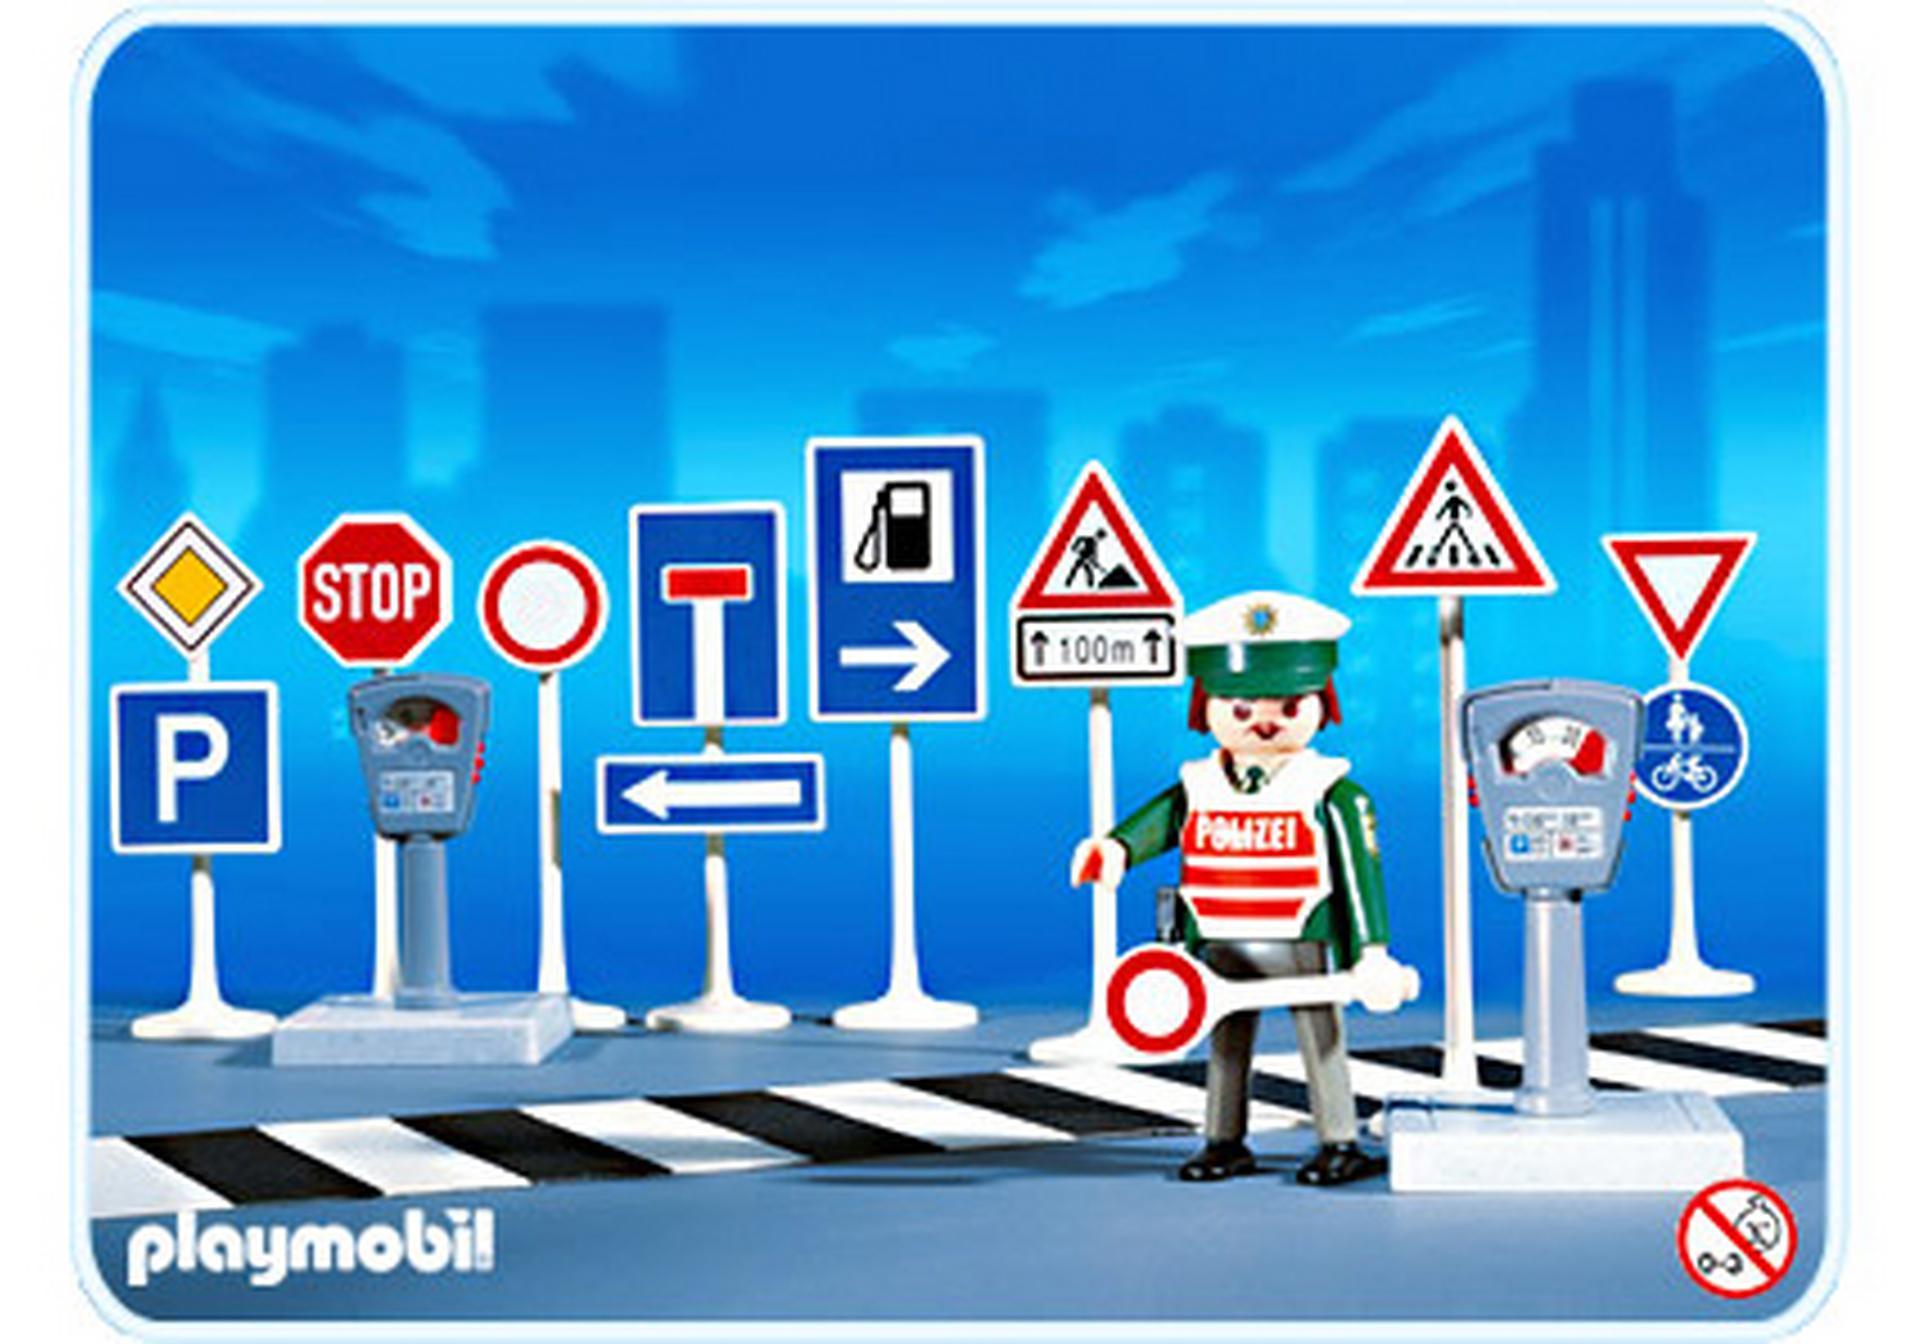 Verkehrsschilder mit polizist 3259 b playmobil for Jugendzimmer playmobil